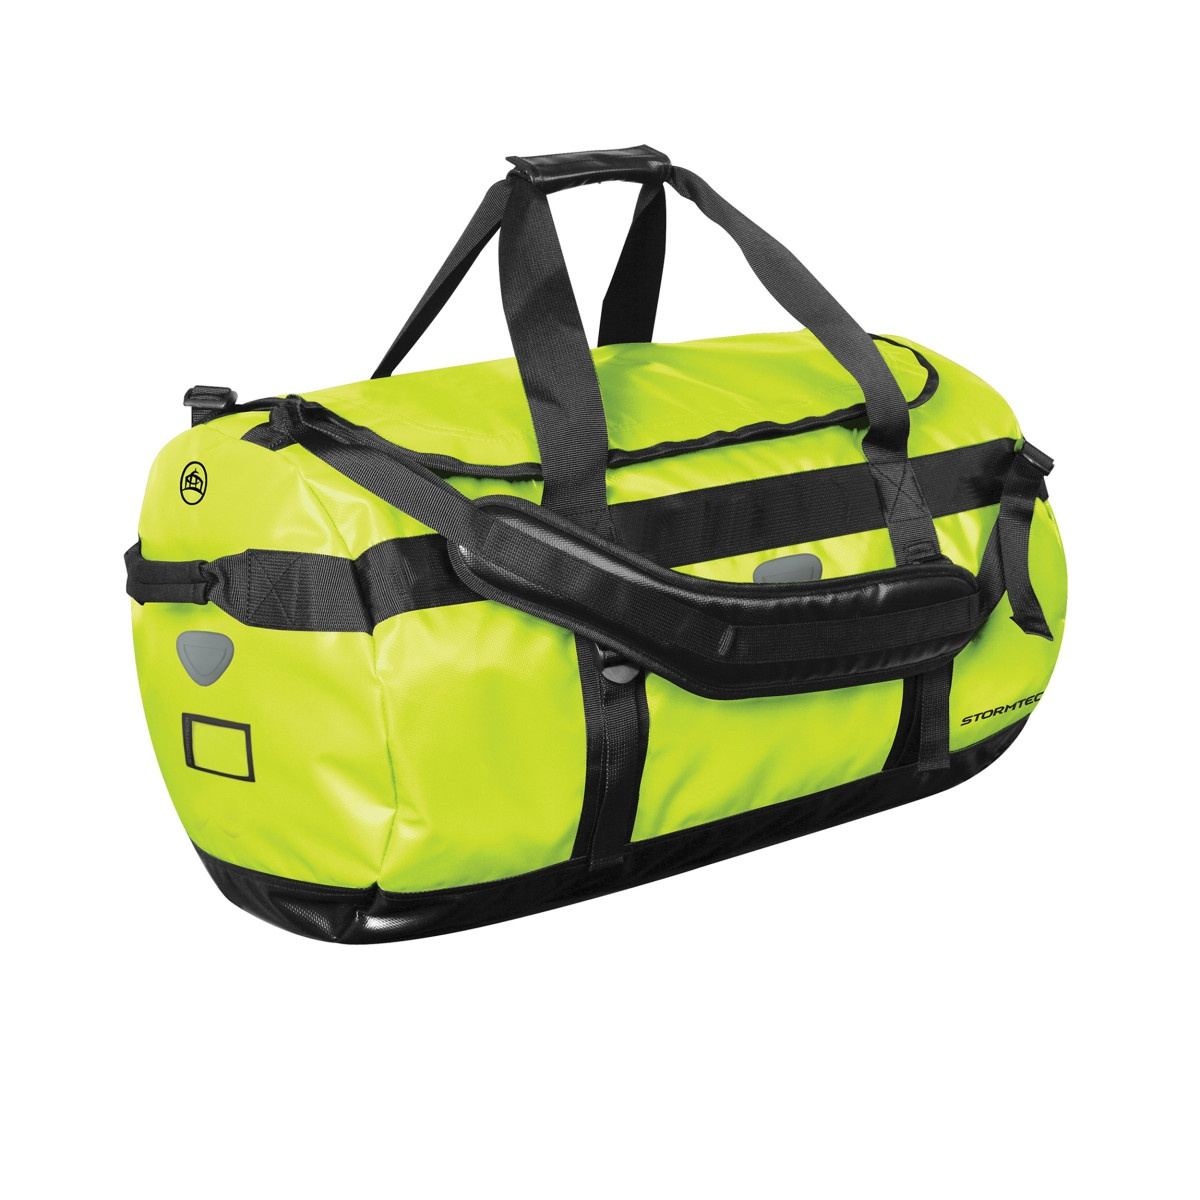 Stormtech Waterproof Gear Holdall Bag (Large) (Pack of 2) (One Size) (Hi Vis Green/Black)